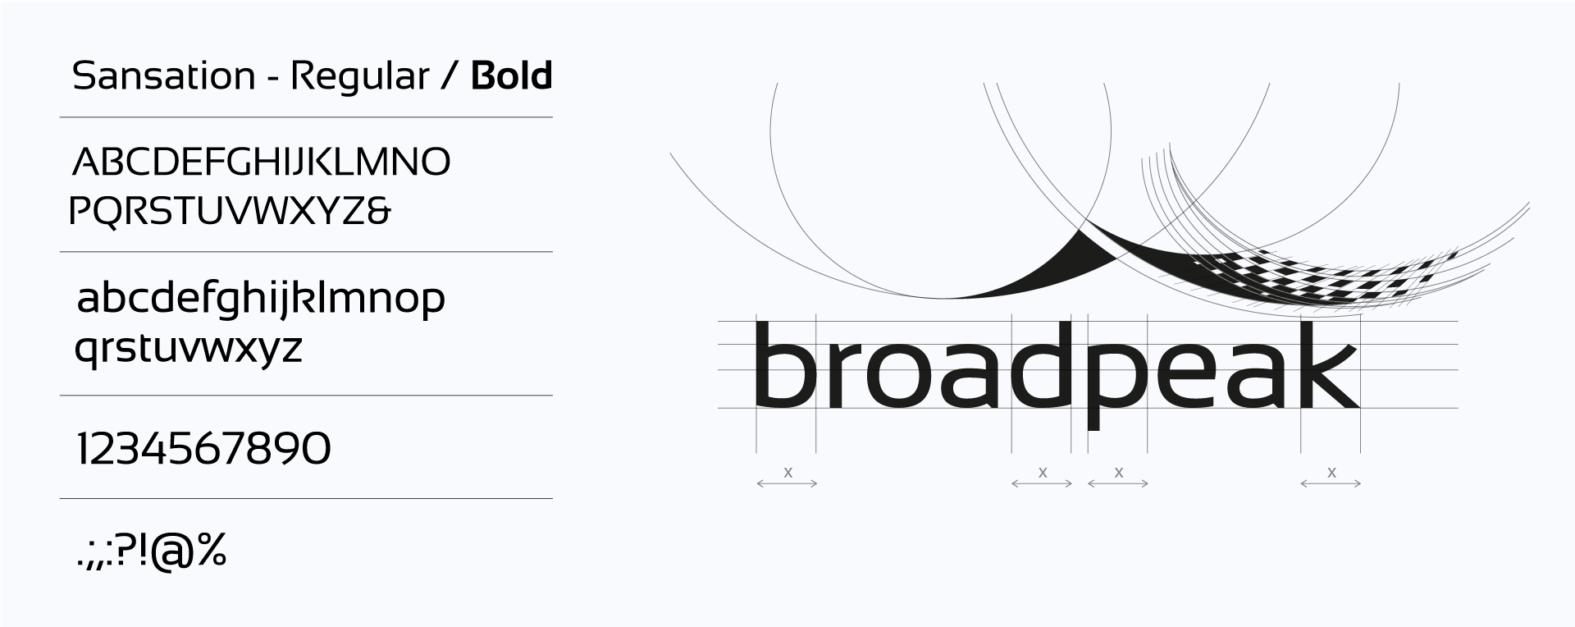 Landeau création Broadpeak construction logotype